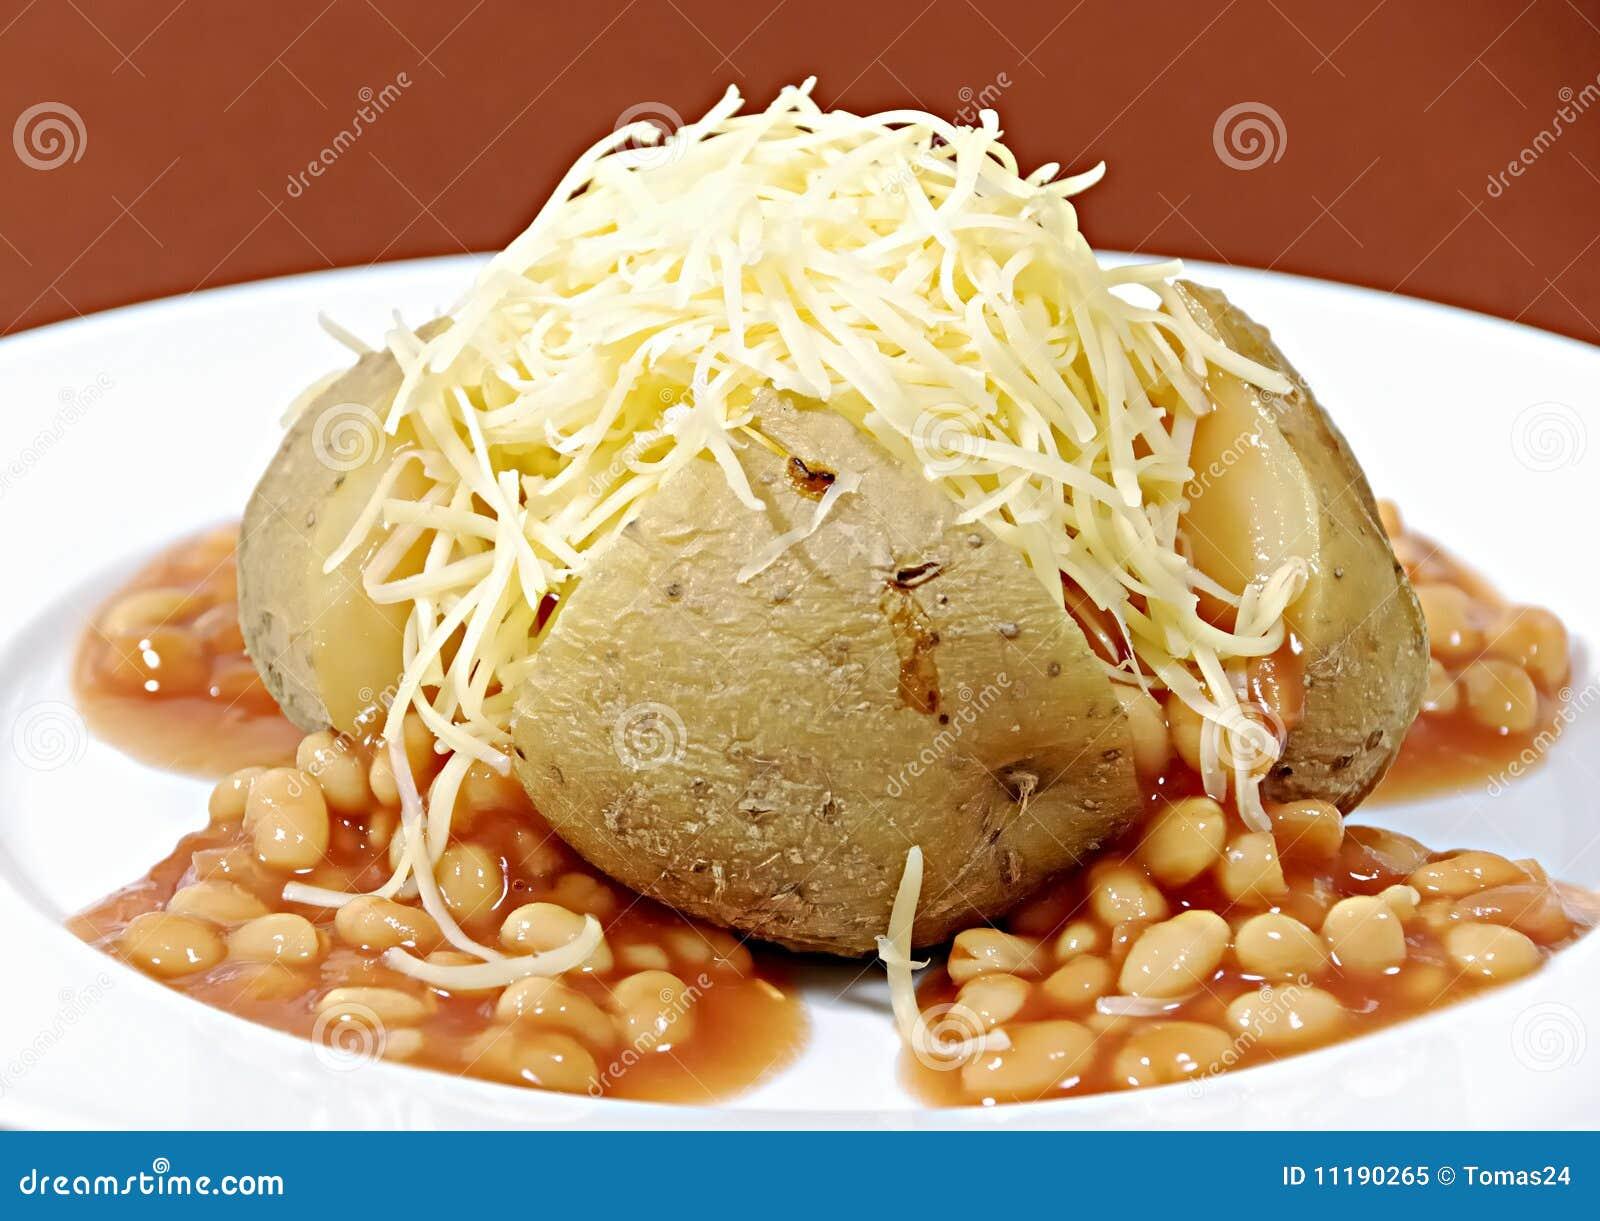 pomme de terre en robe de chambre image stock image du repas manger 11190265. Black Bedroom Furniture Sets. Home Design Ideas